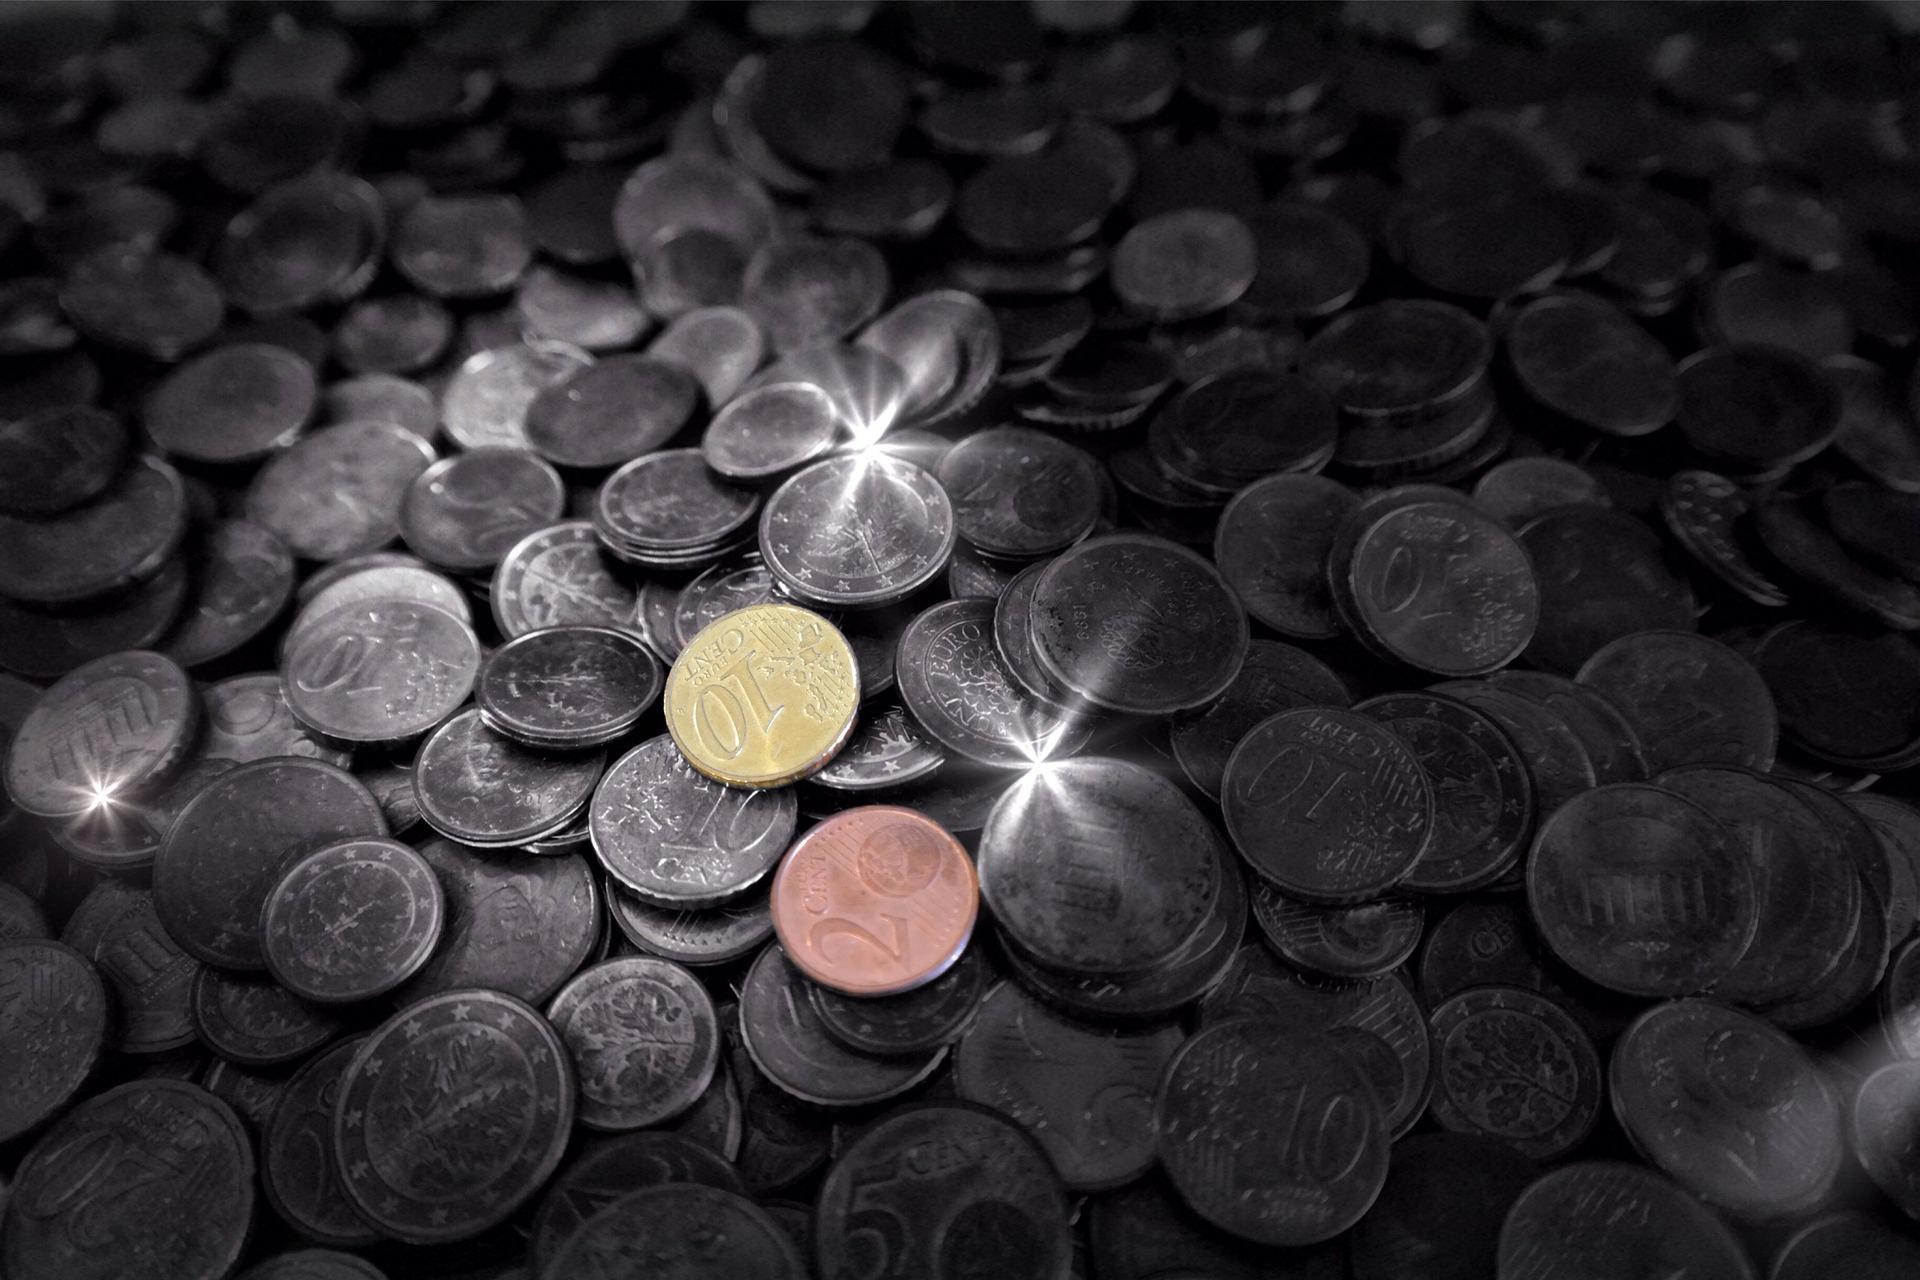 Münzgeld